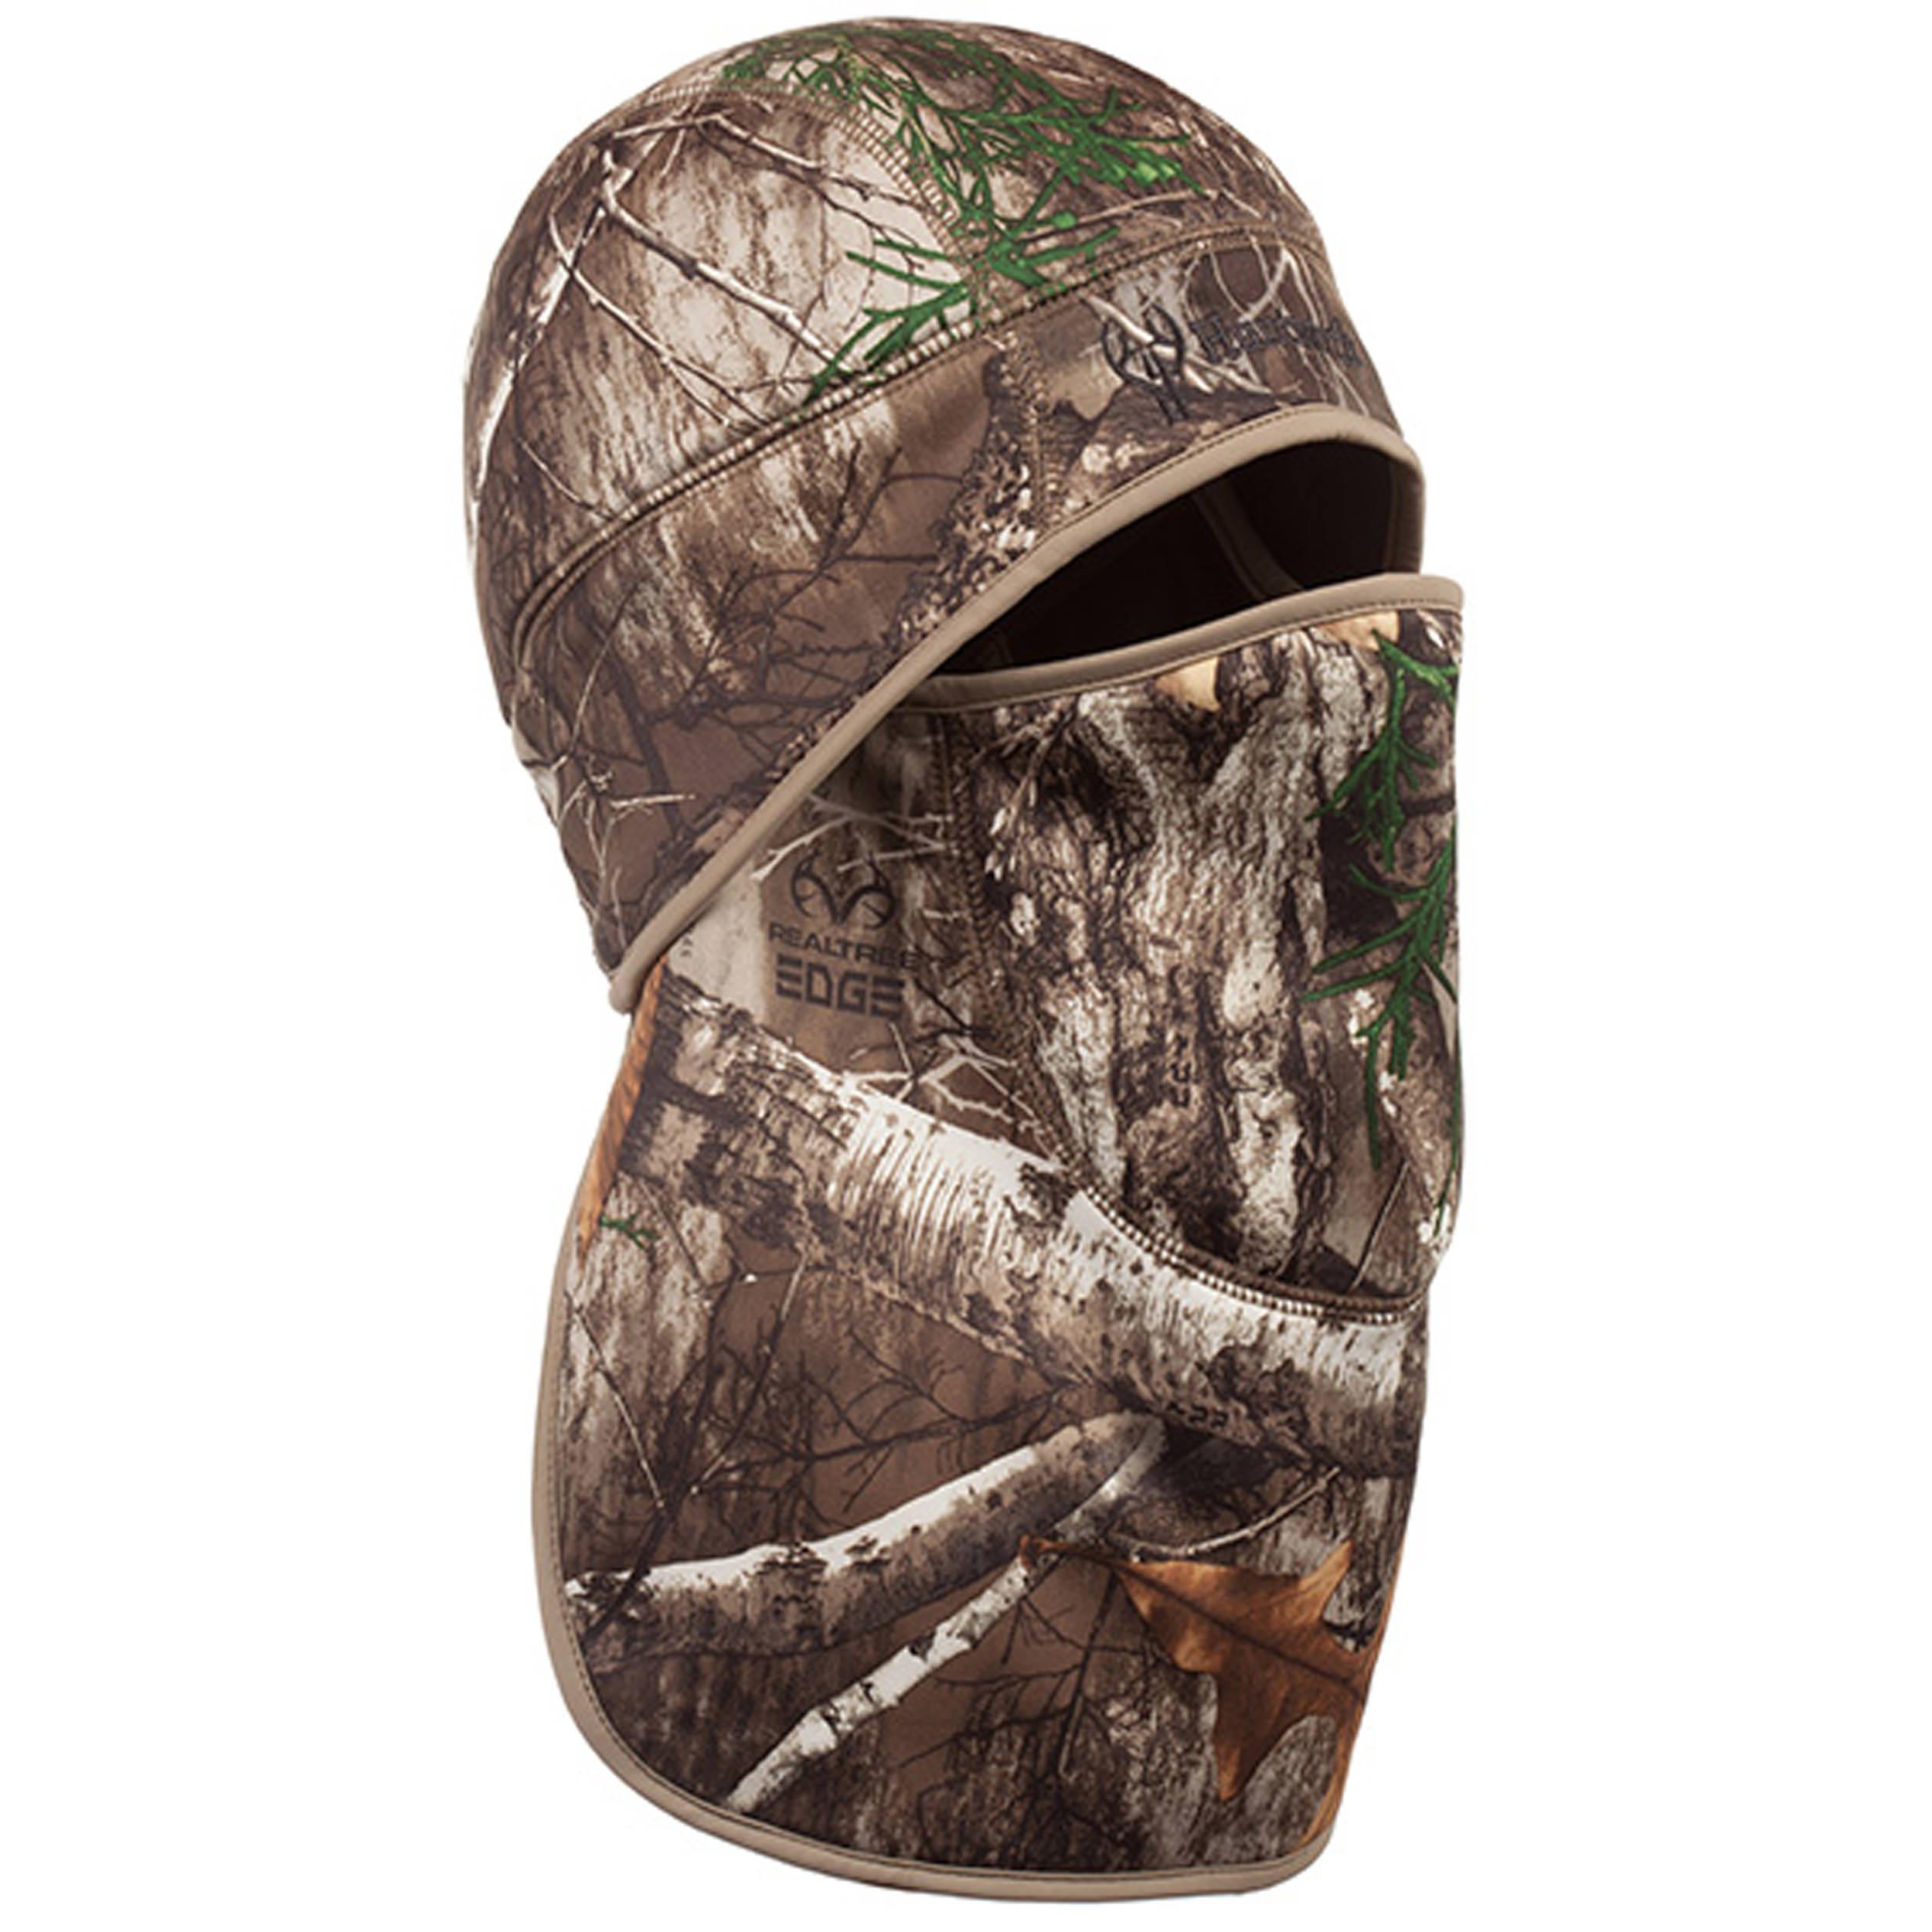 Mens Real Tree Edge 3 in 1 Hunting Hat/Facemask - Walmart.com